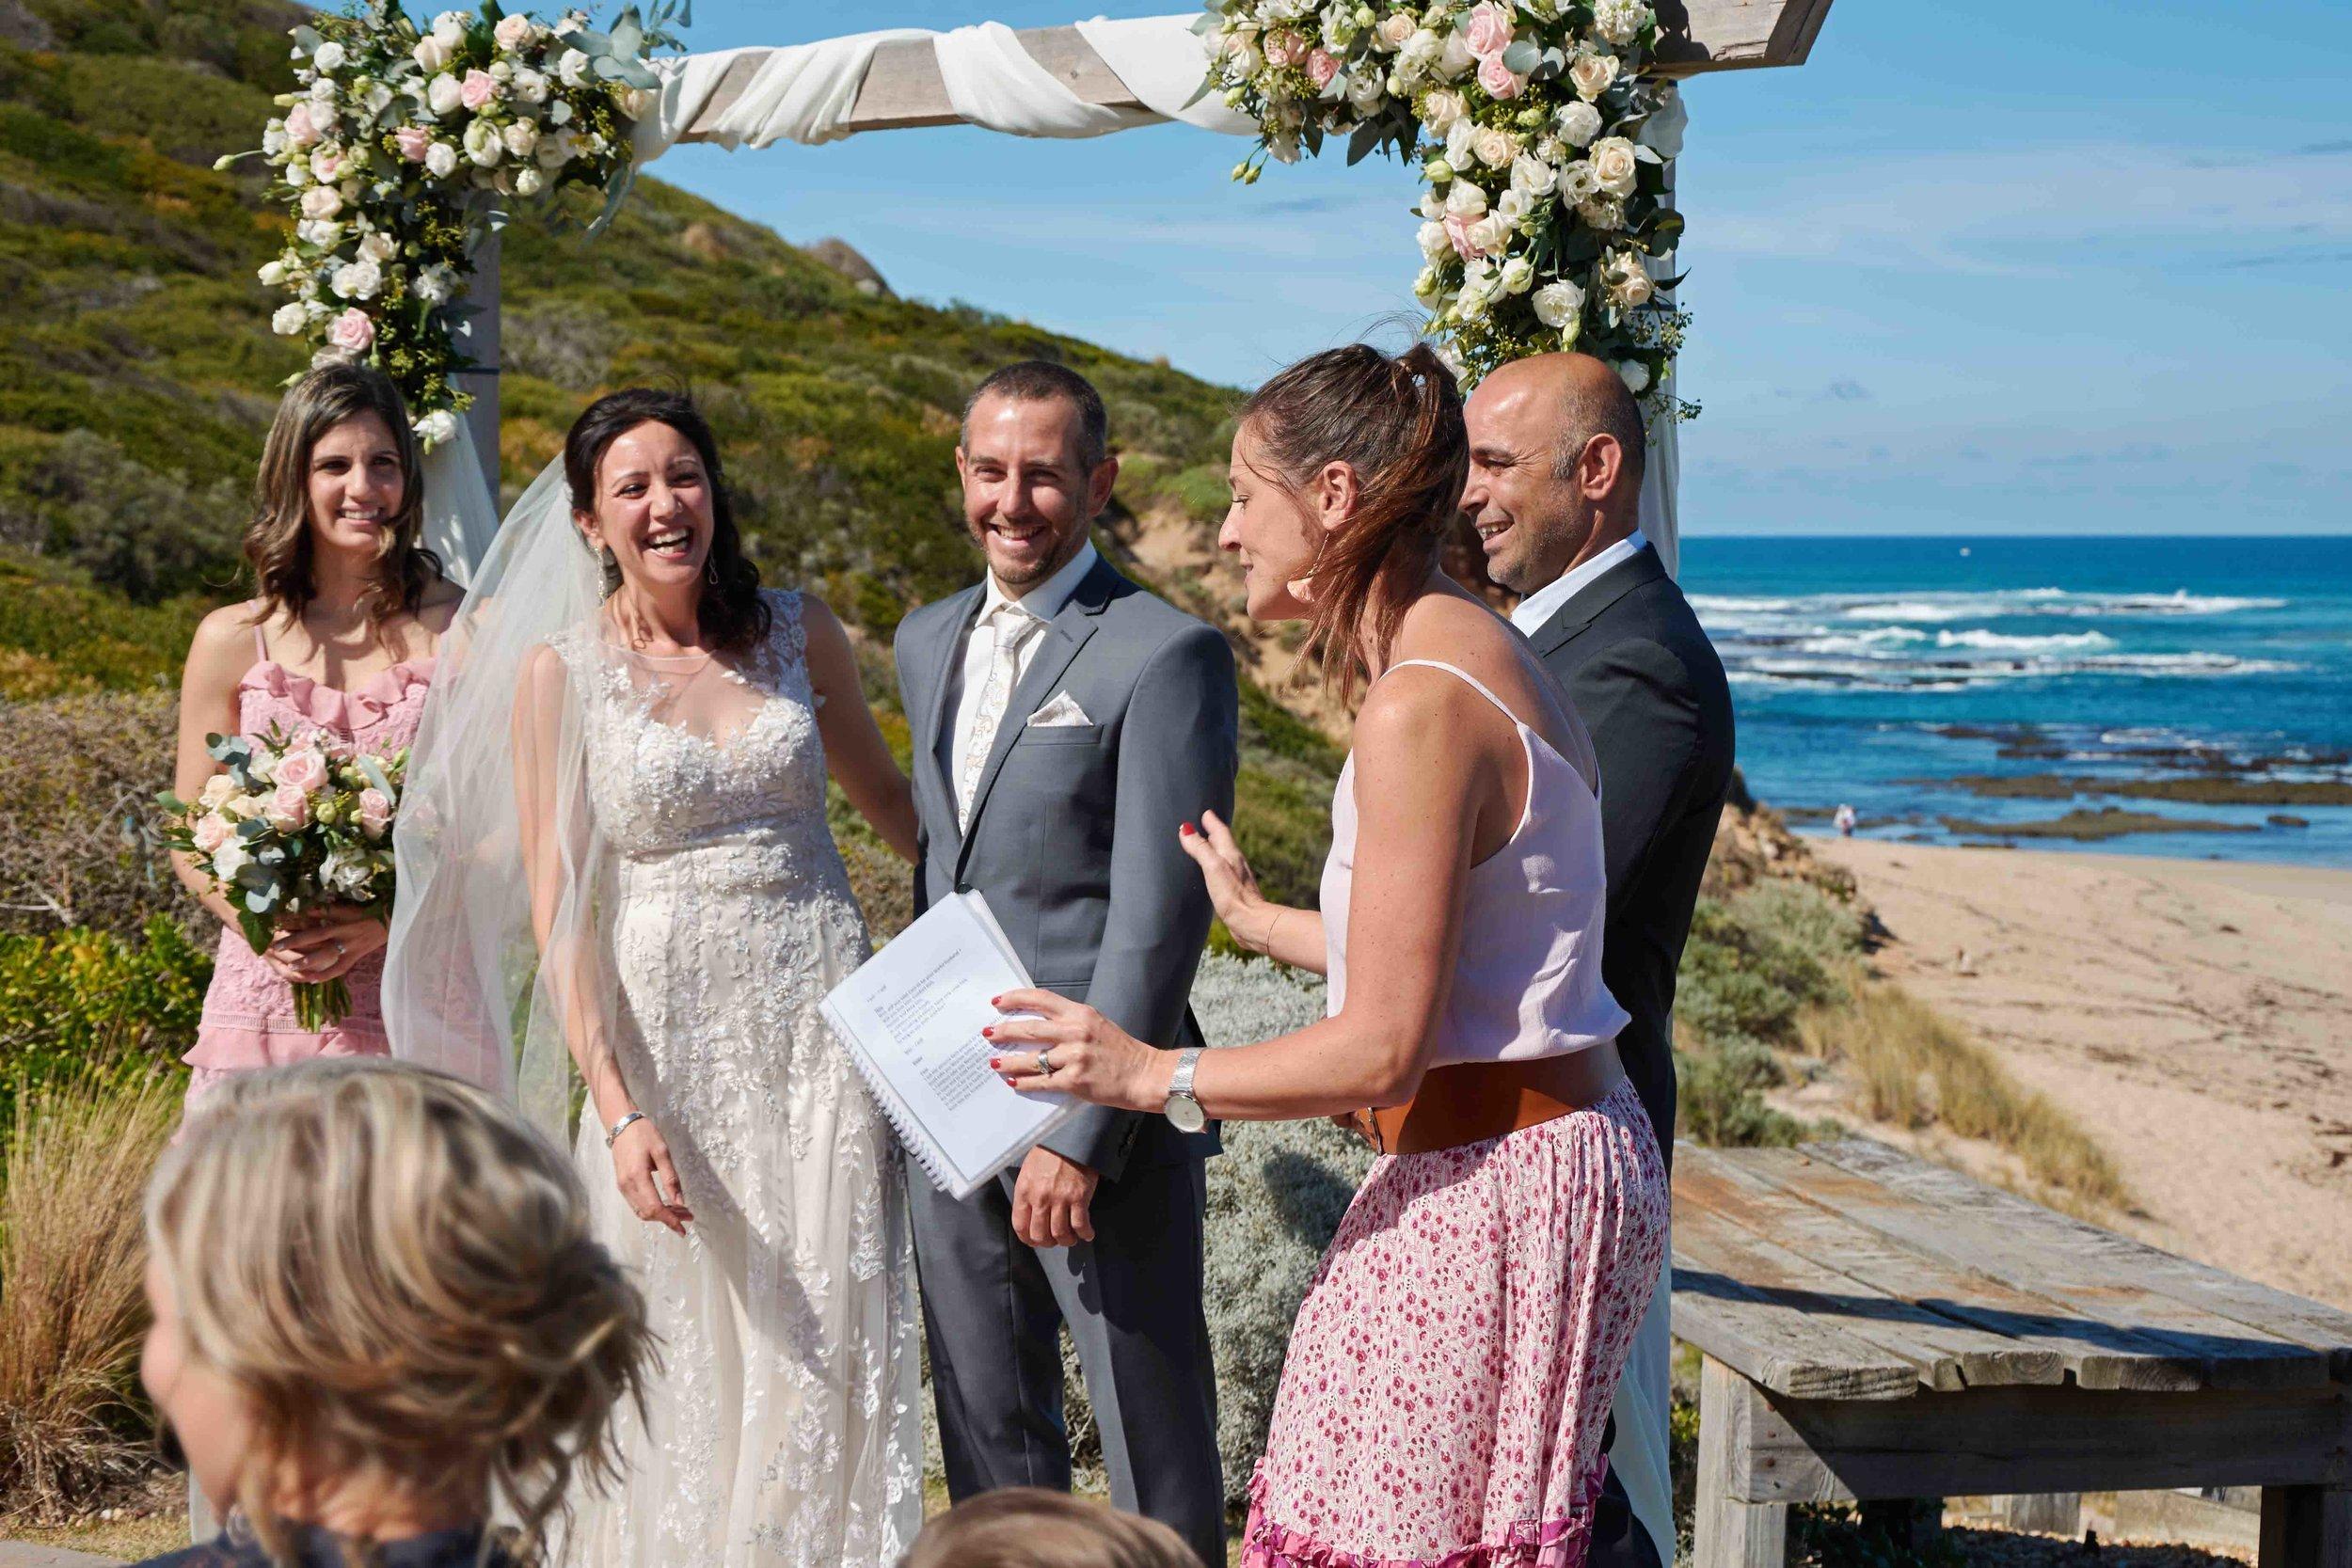 sorrento-wedding-photography-all-smiles-marissa-jade-photography-50.jpg